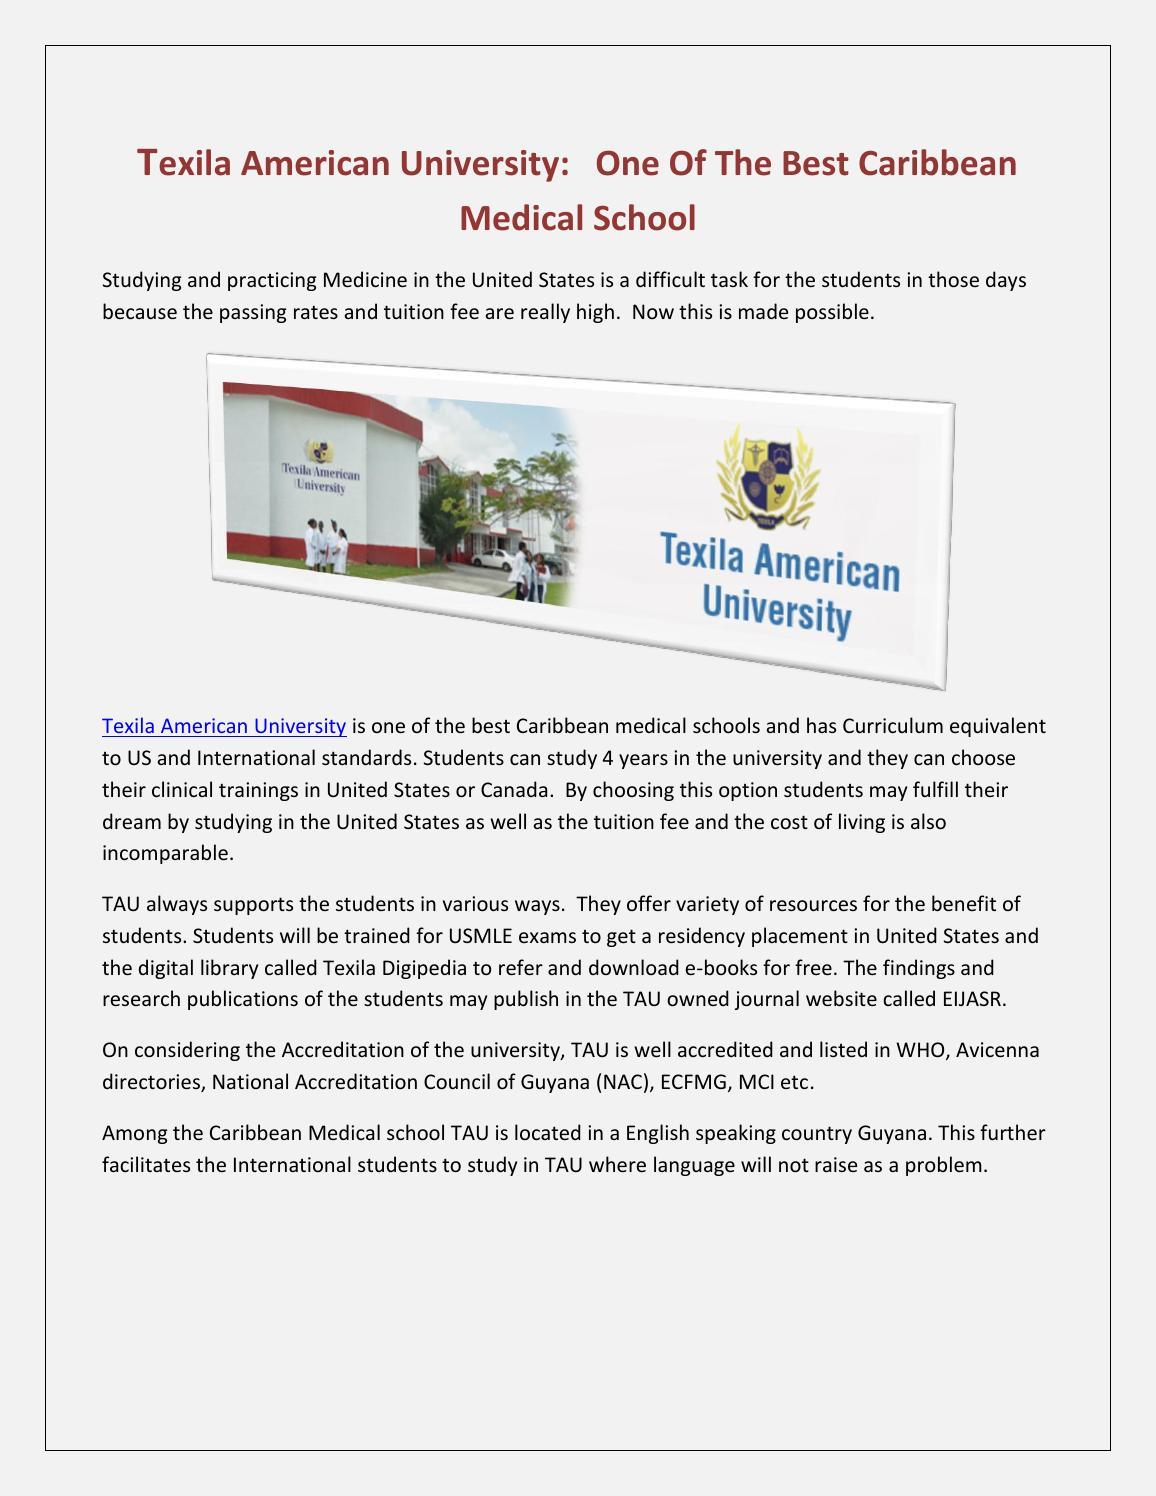 Texila american university best caribbean medical school by petermikecarmed  - issuu